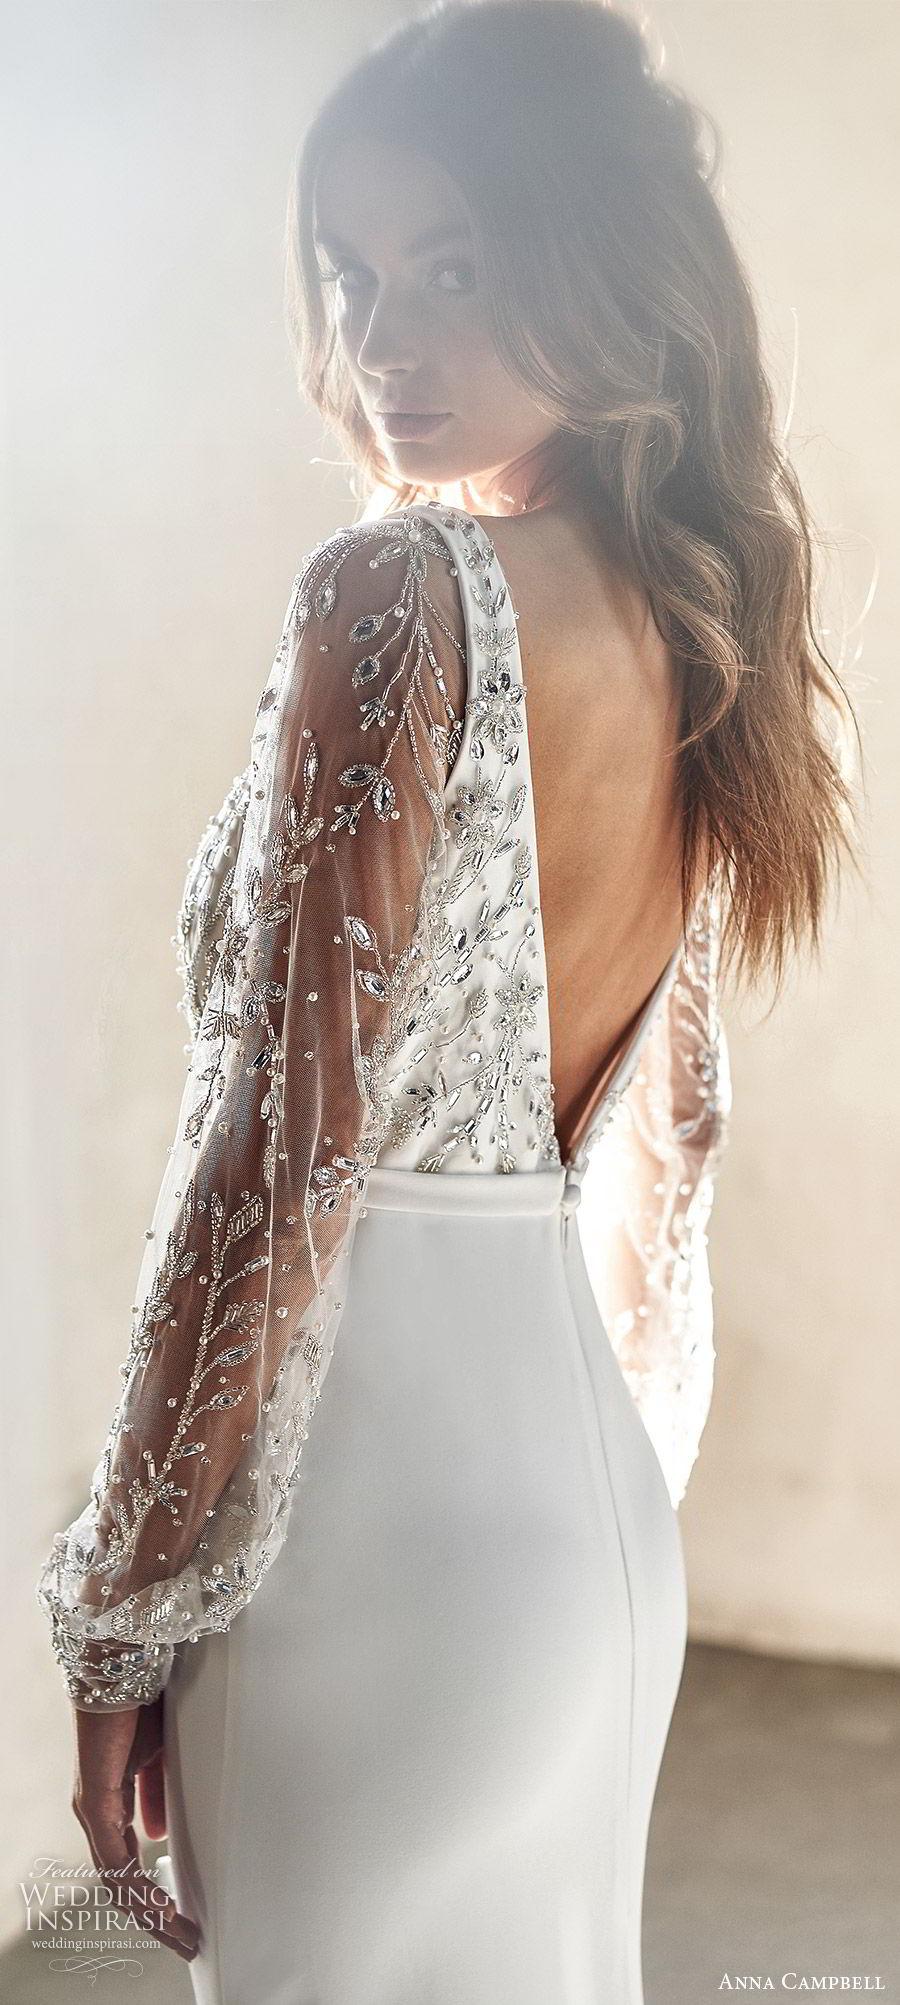 anna campbell 2020 bridal long illusion sleeves sleeveless thick straps deep v neckline embellished bodice clean skirt sheath wedding dress (1) elegant sexy low v back chapel train  zbv